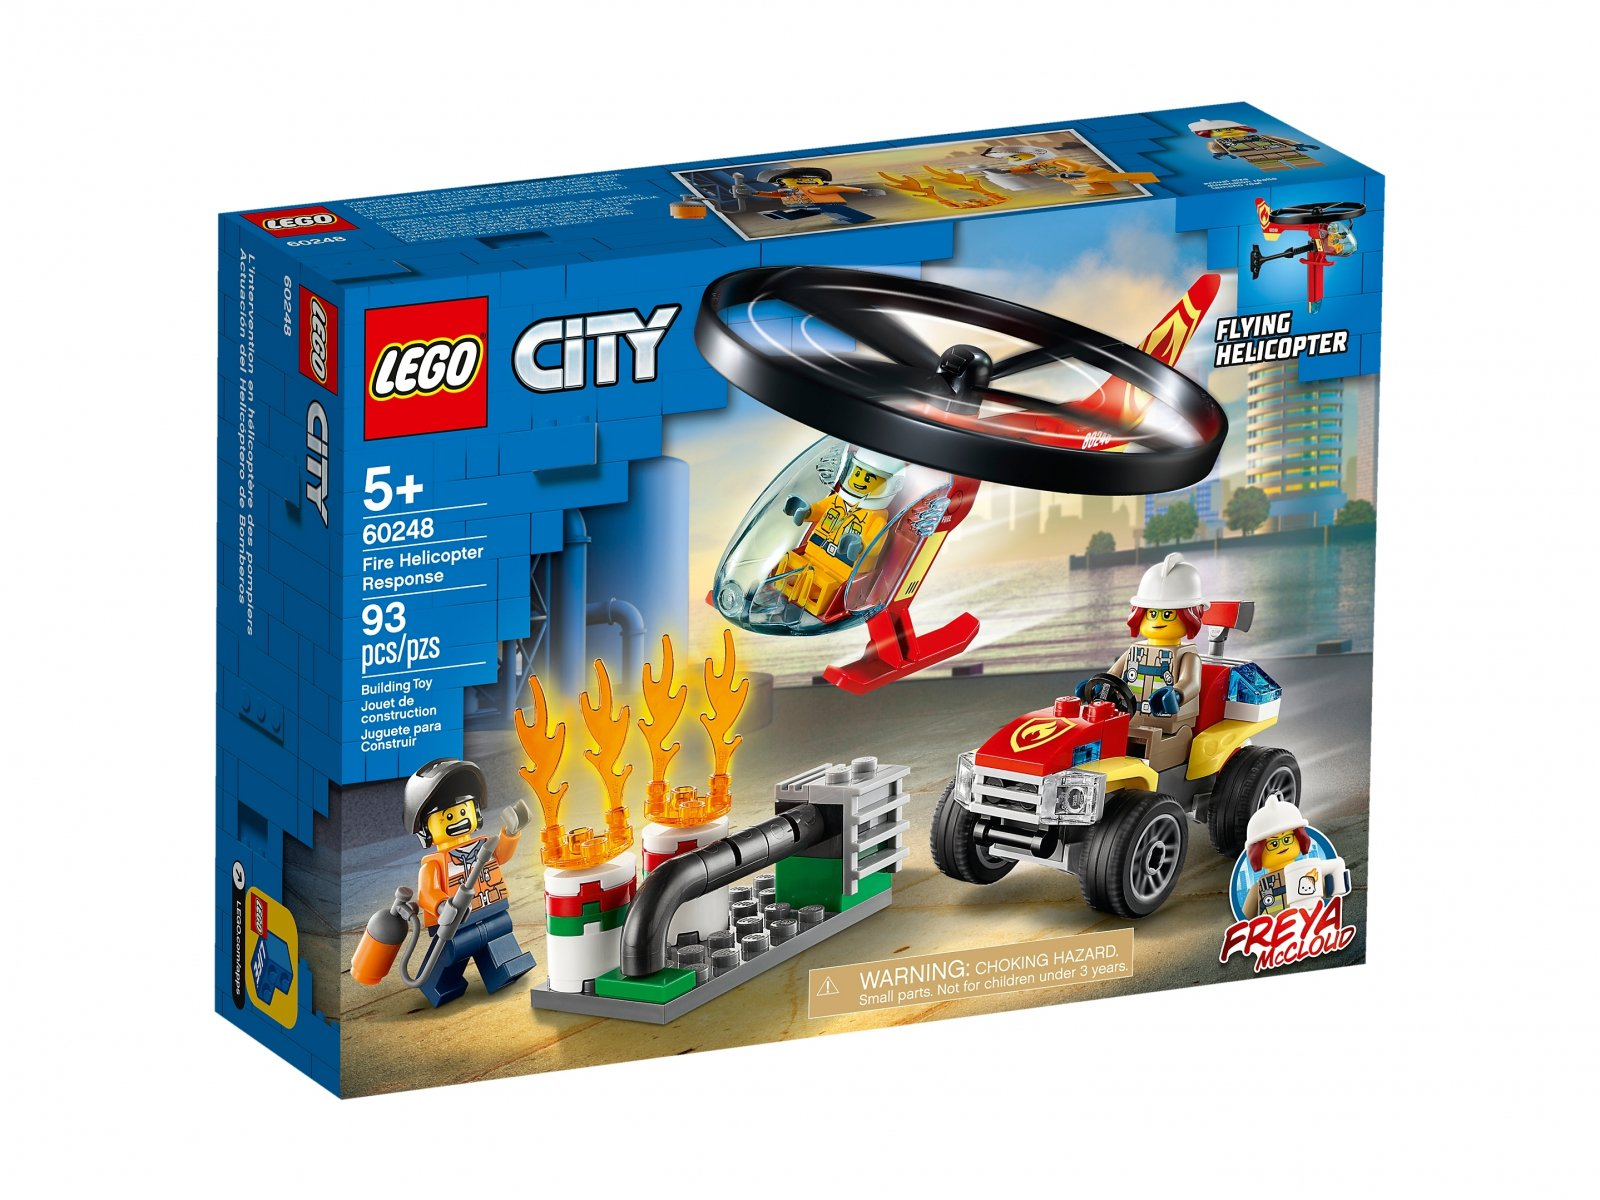 LEGO City Helikopter strażacki leci na ratunek 60248